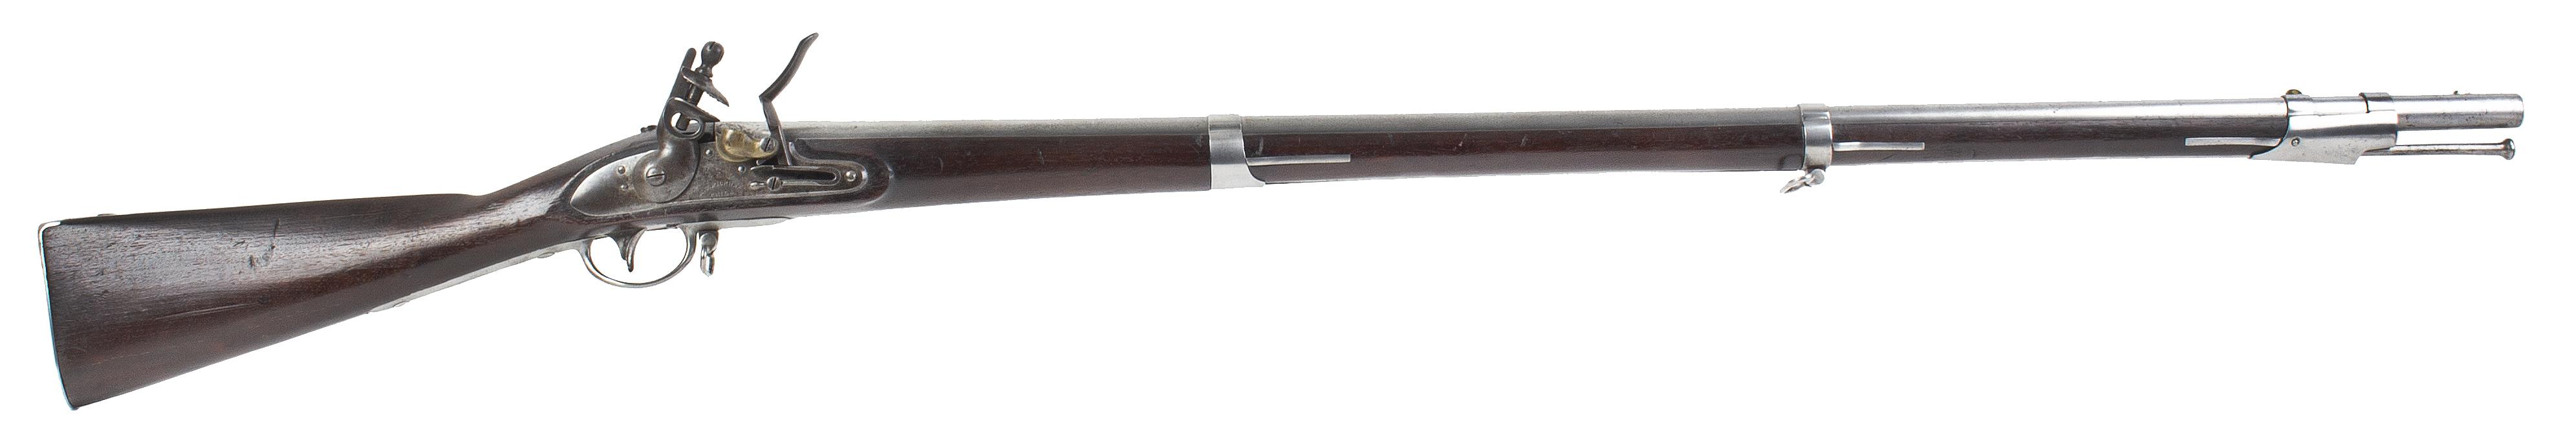 US Model 1816 Musket, Type I by M.T. Wickham of Philadelphia, & Bayonet, right facing